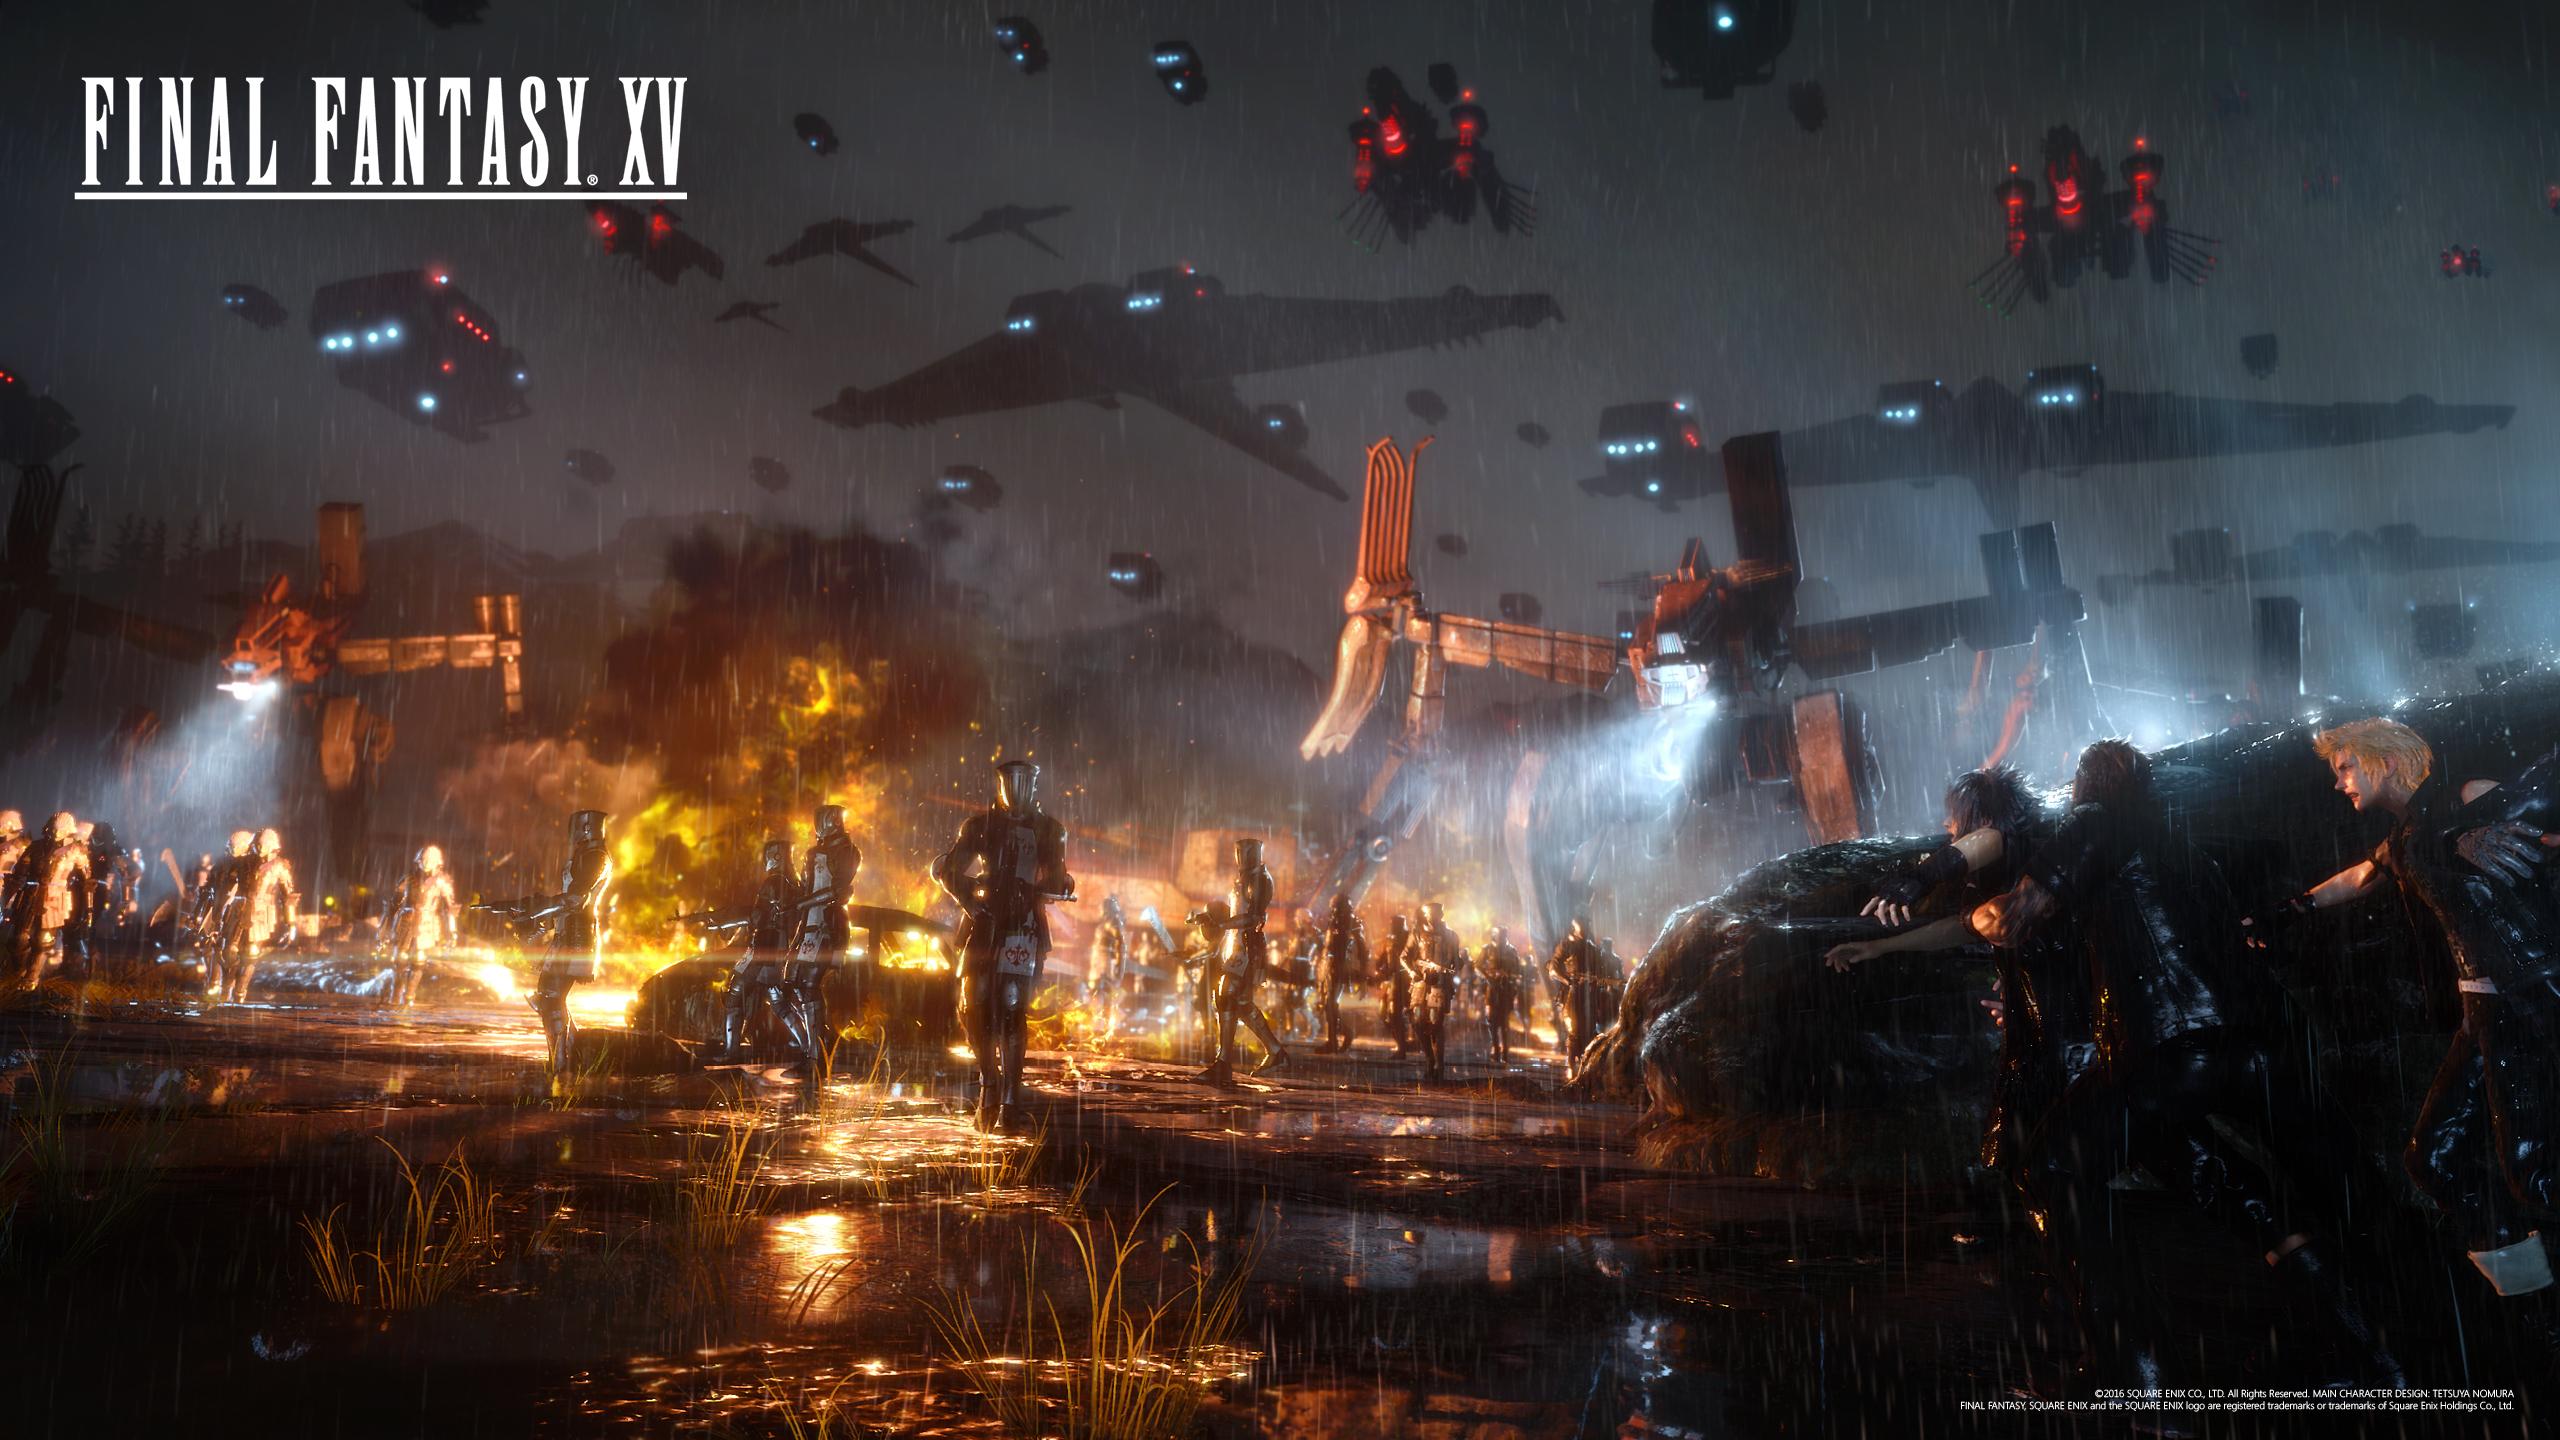 2560x1440 px, Final Fantasy XV